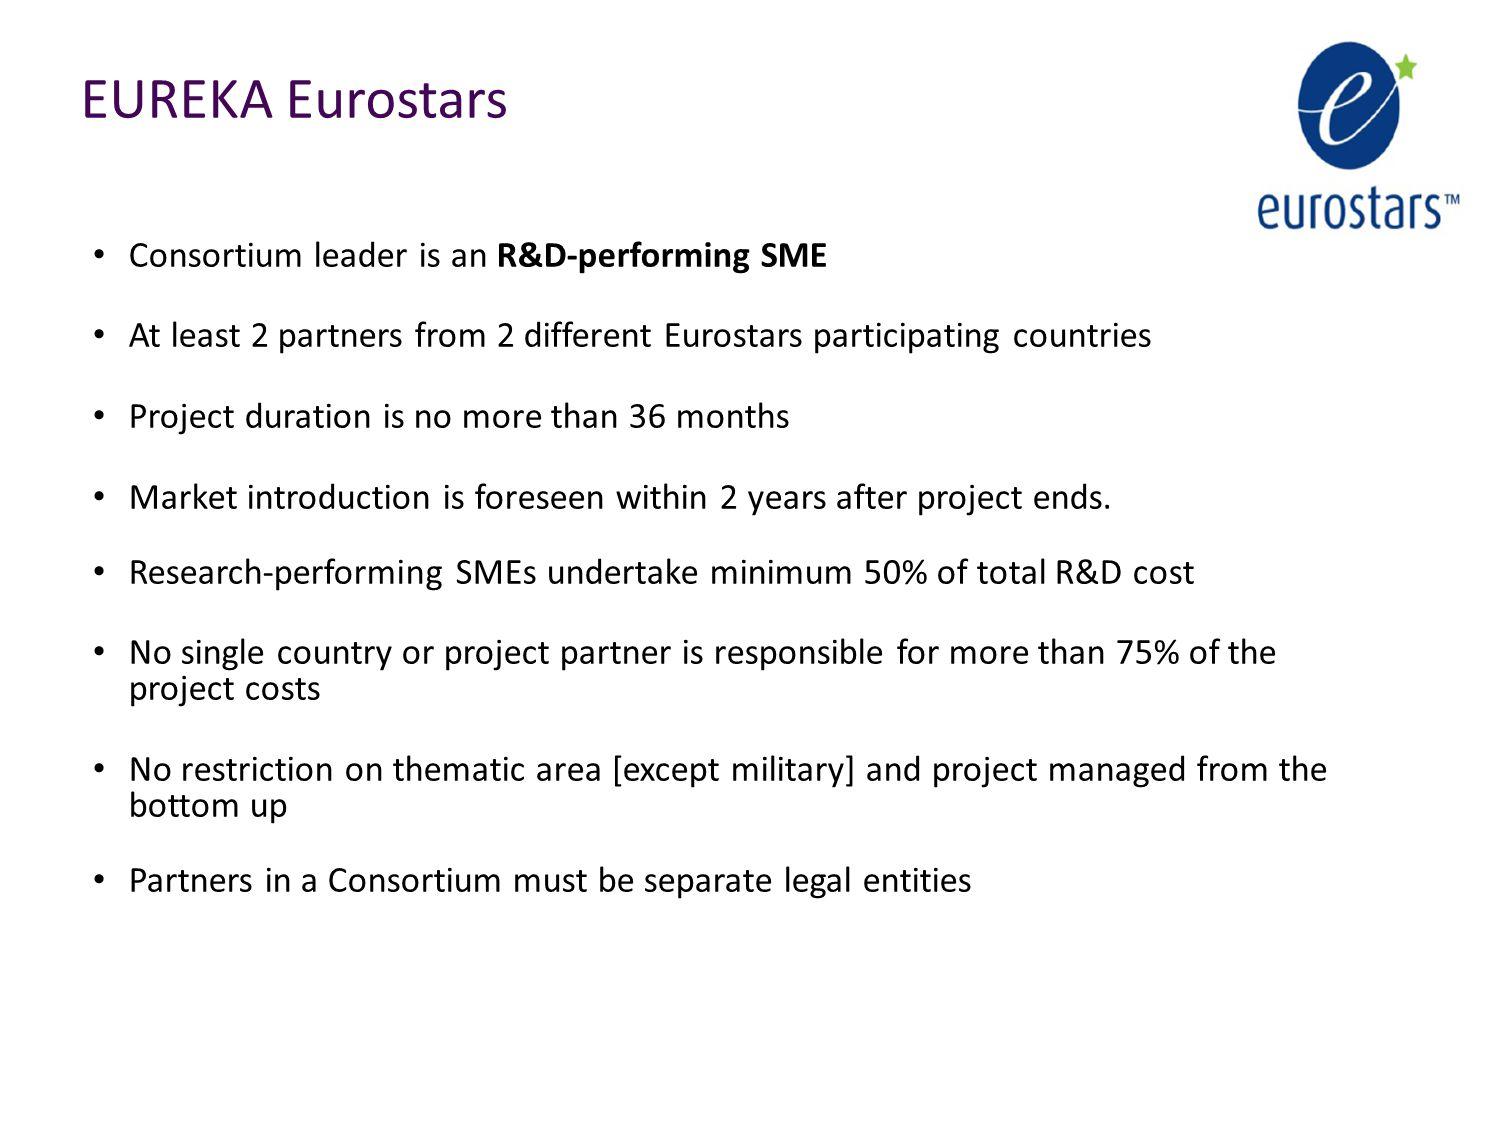 EUREKA Eurostars Consortium leader is an R&D-performing SME